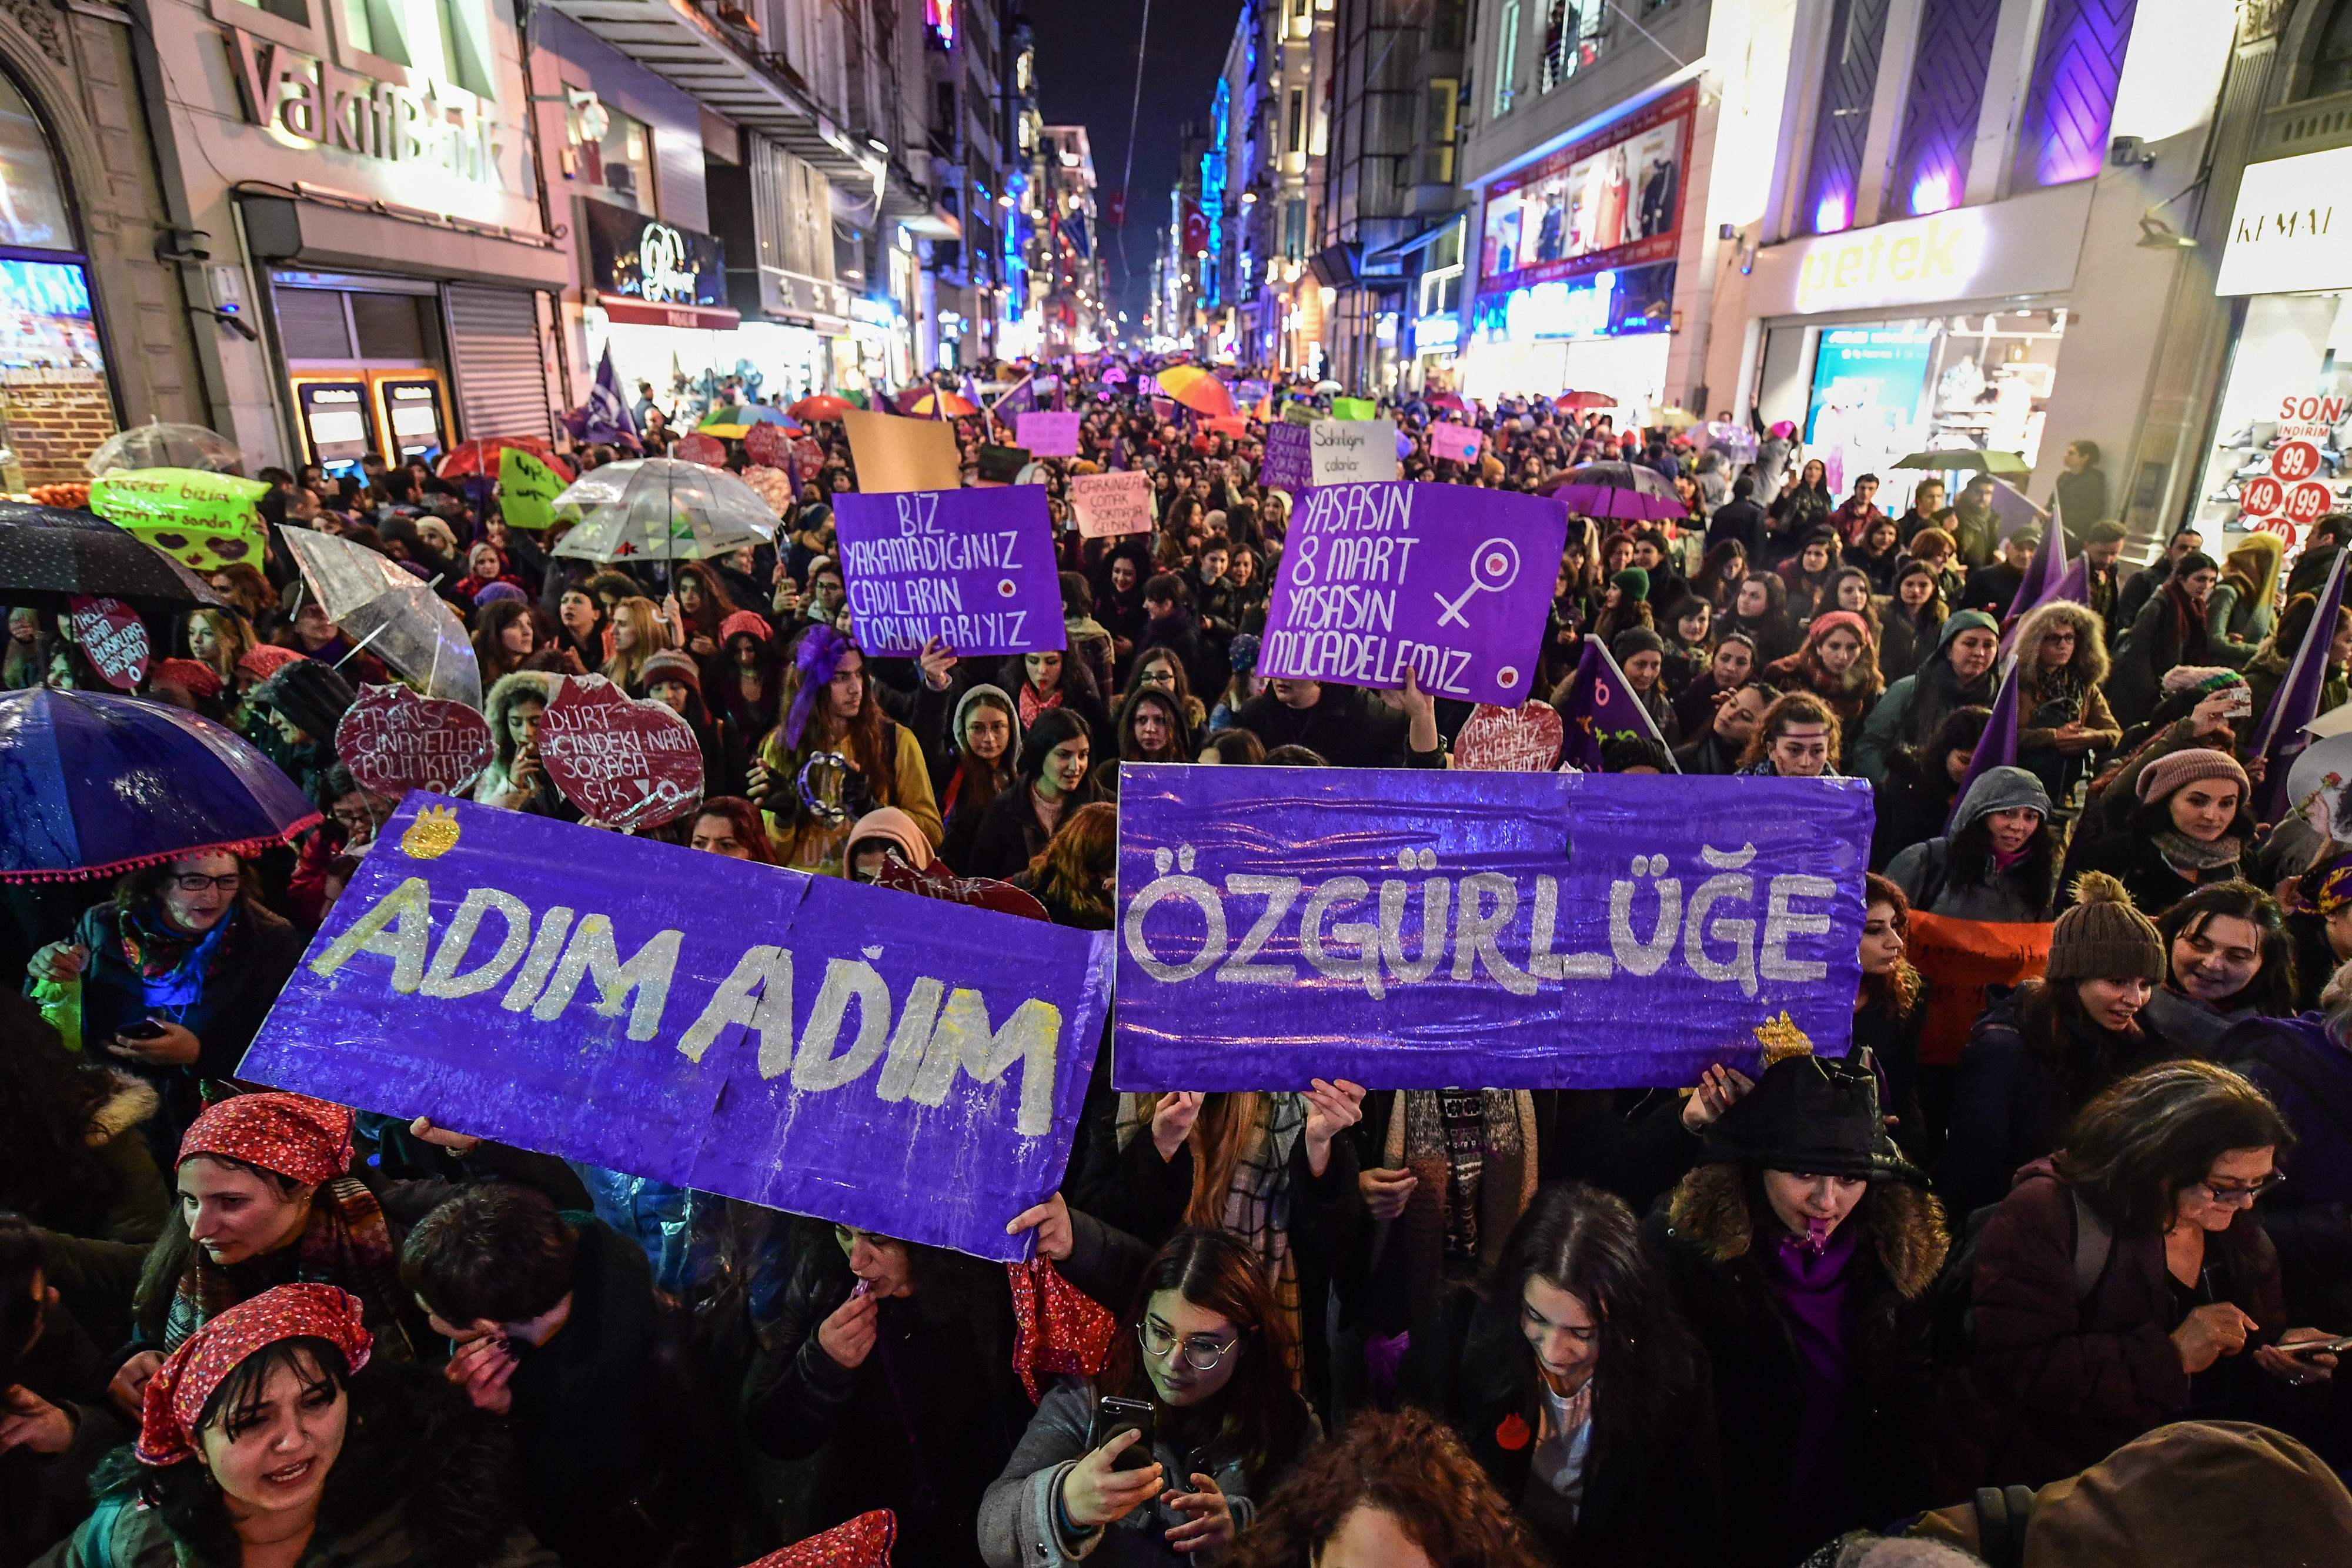 تظاهرات إسطنبول